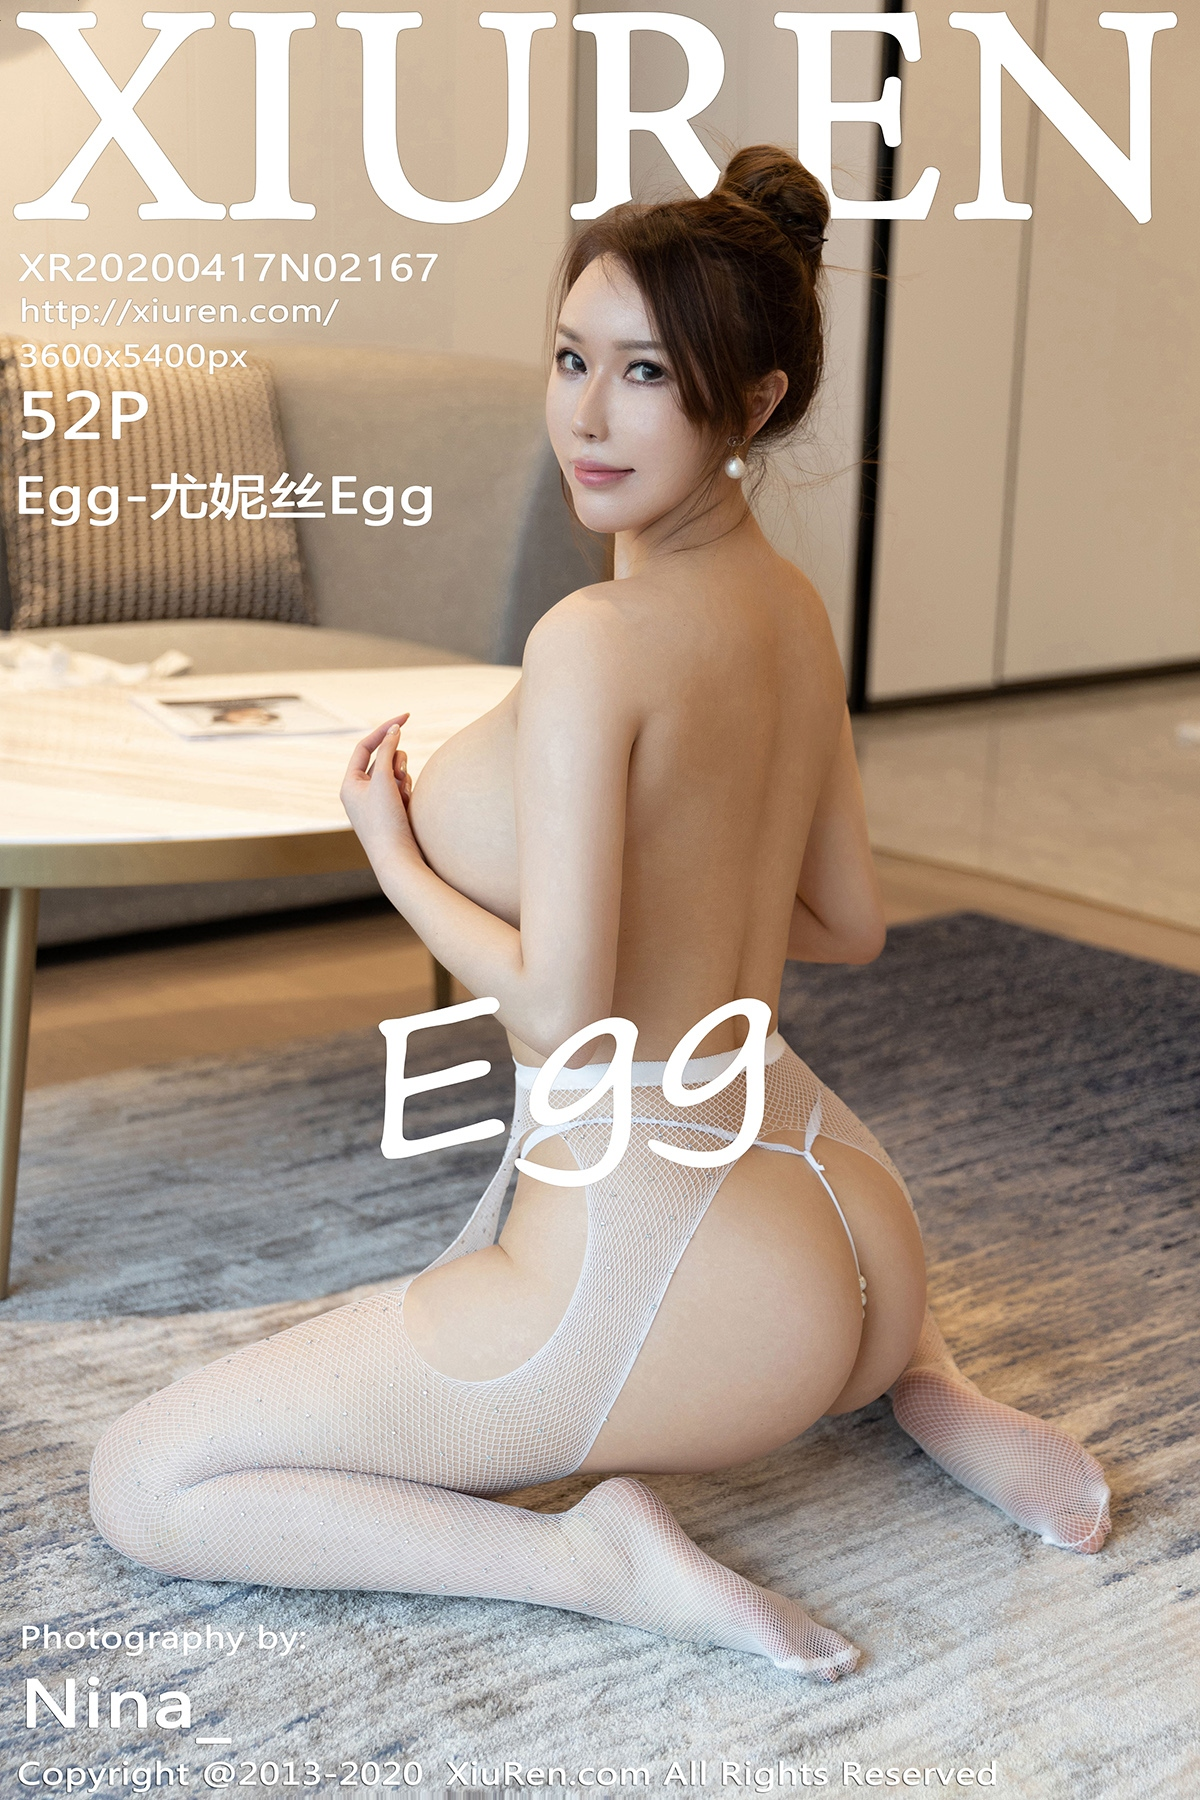 [XiuRen秀人网]2020.04.17 No.2167 Egg-尤妮丝Egg 情趣内衣[/233MB]